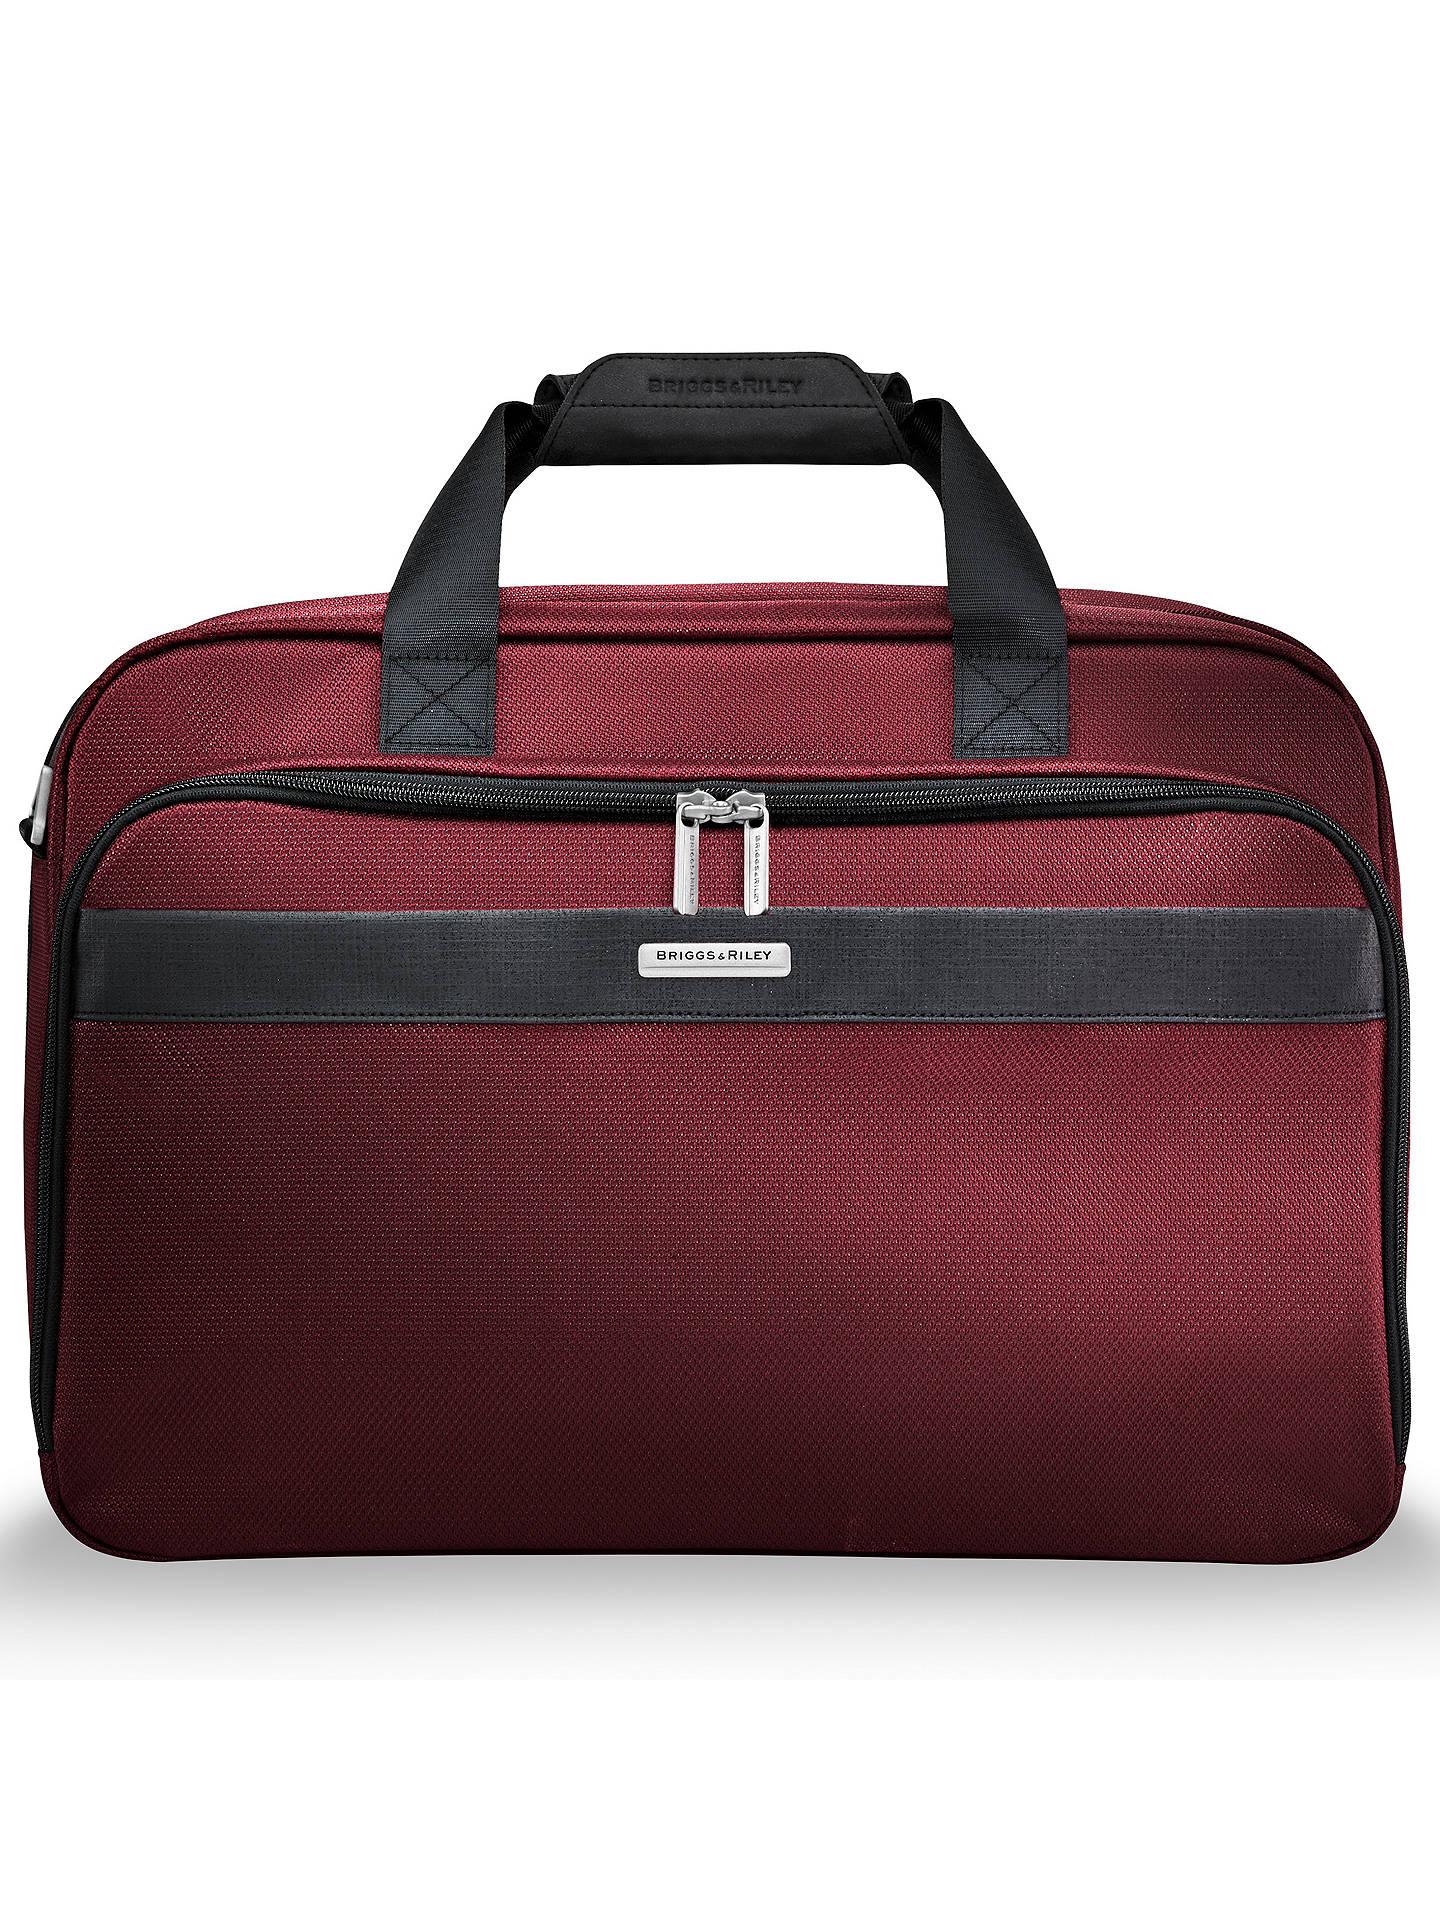 5f0025bd54d Buy Briggs & Riley Transcend Clamshell Cabin Bag, Merlot Online at  johnlewis. ...